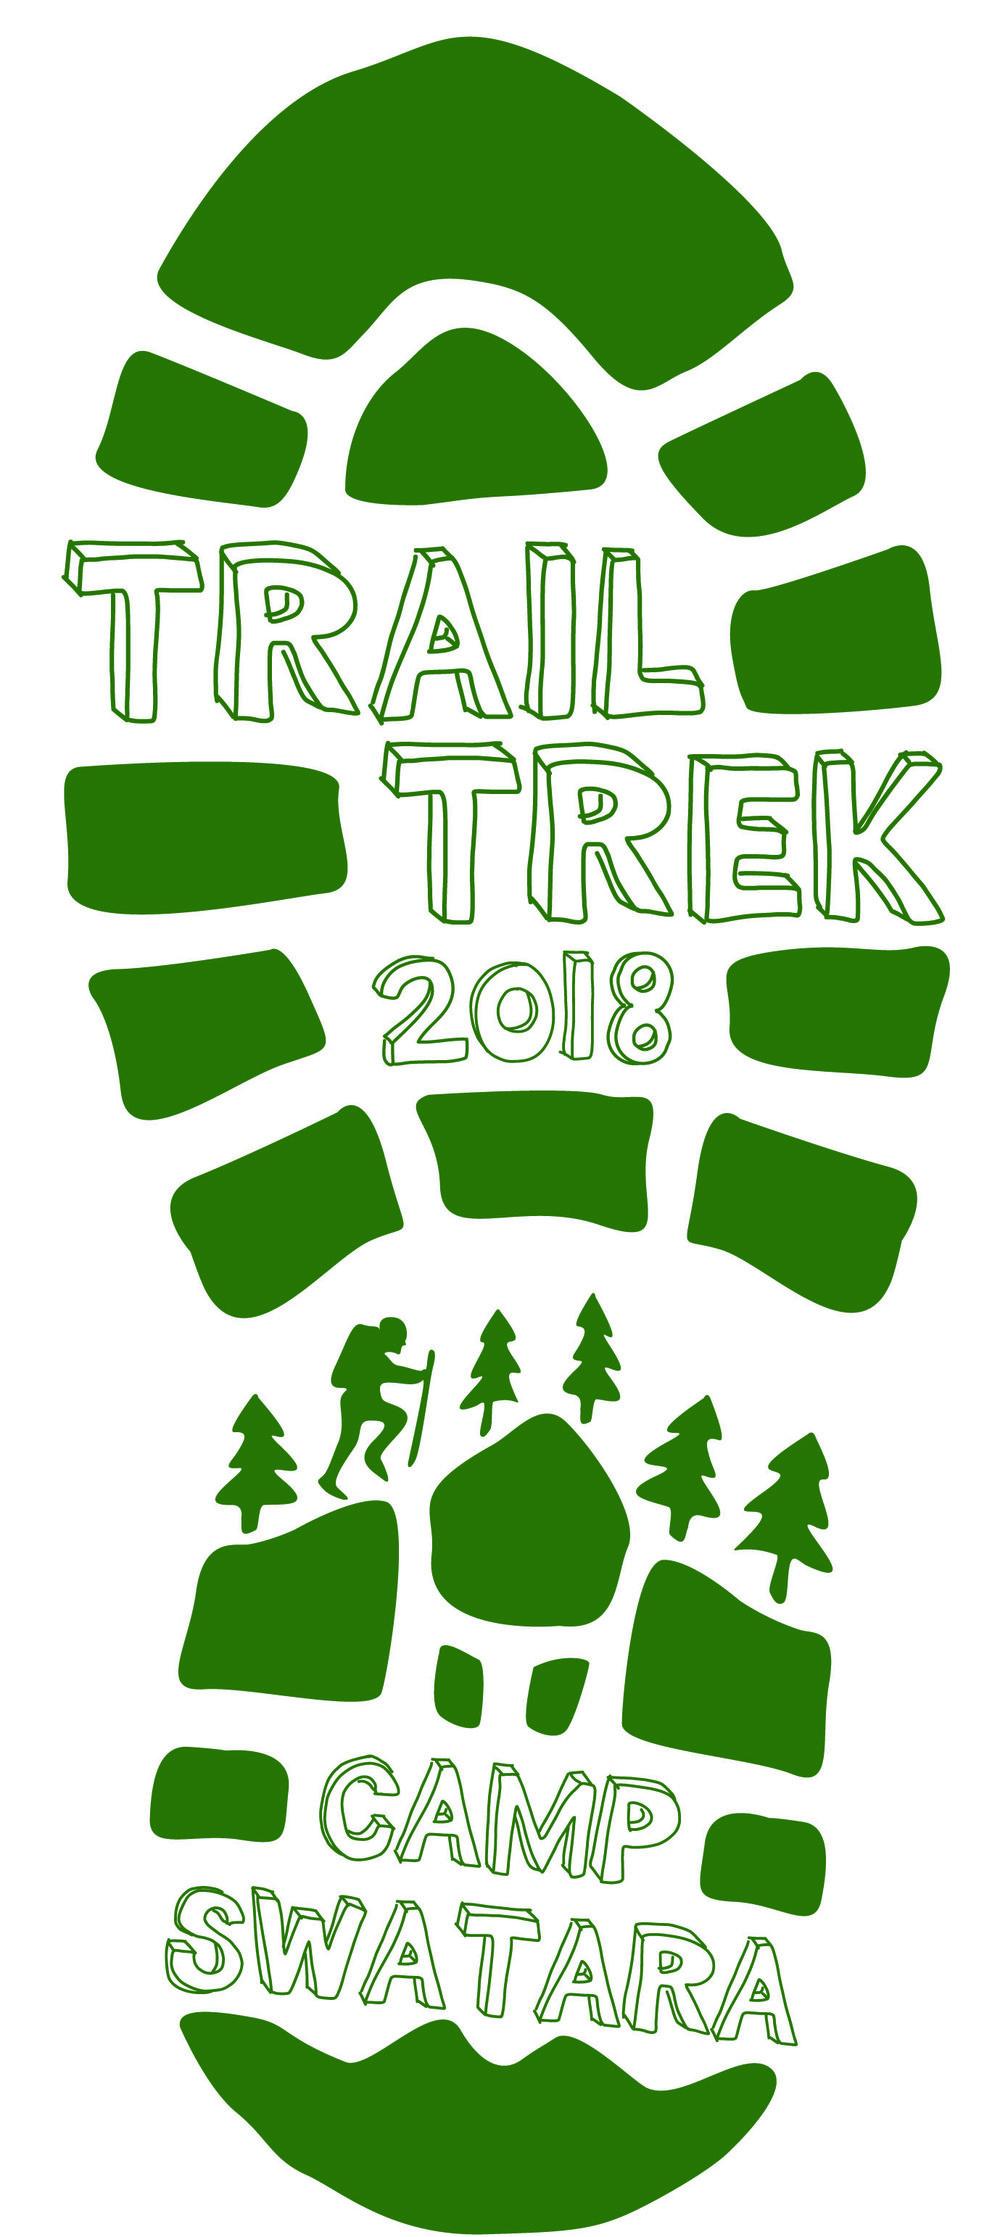 Trail Trek 2018 (1).jpg